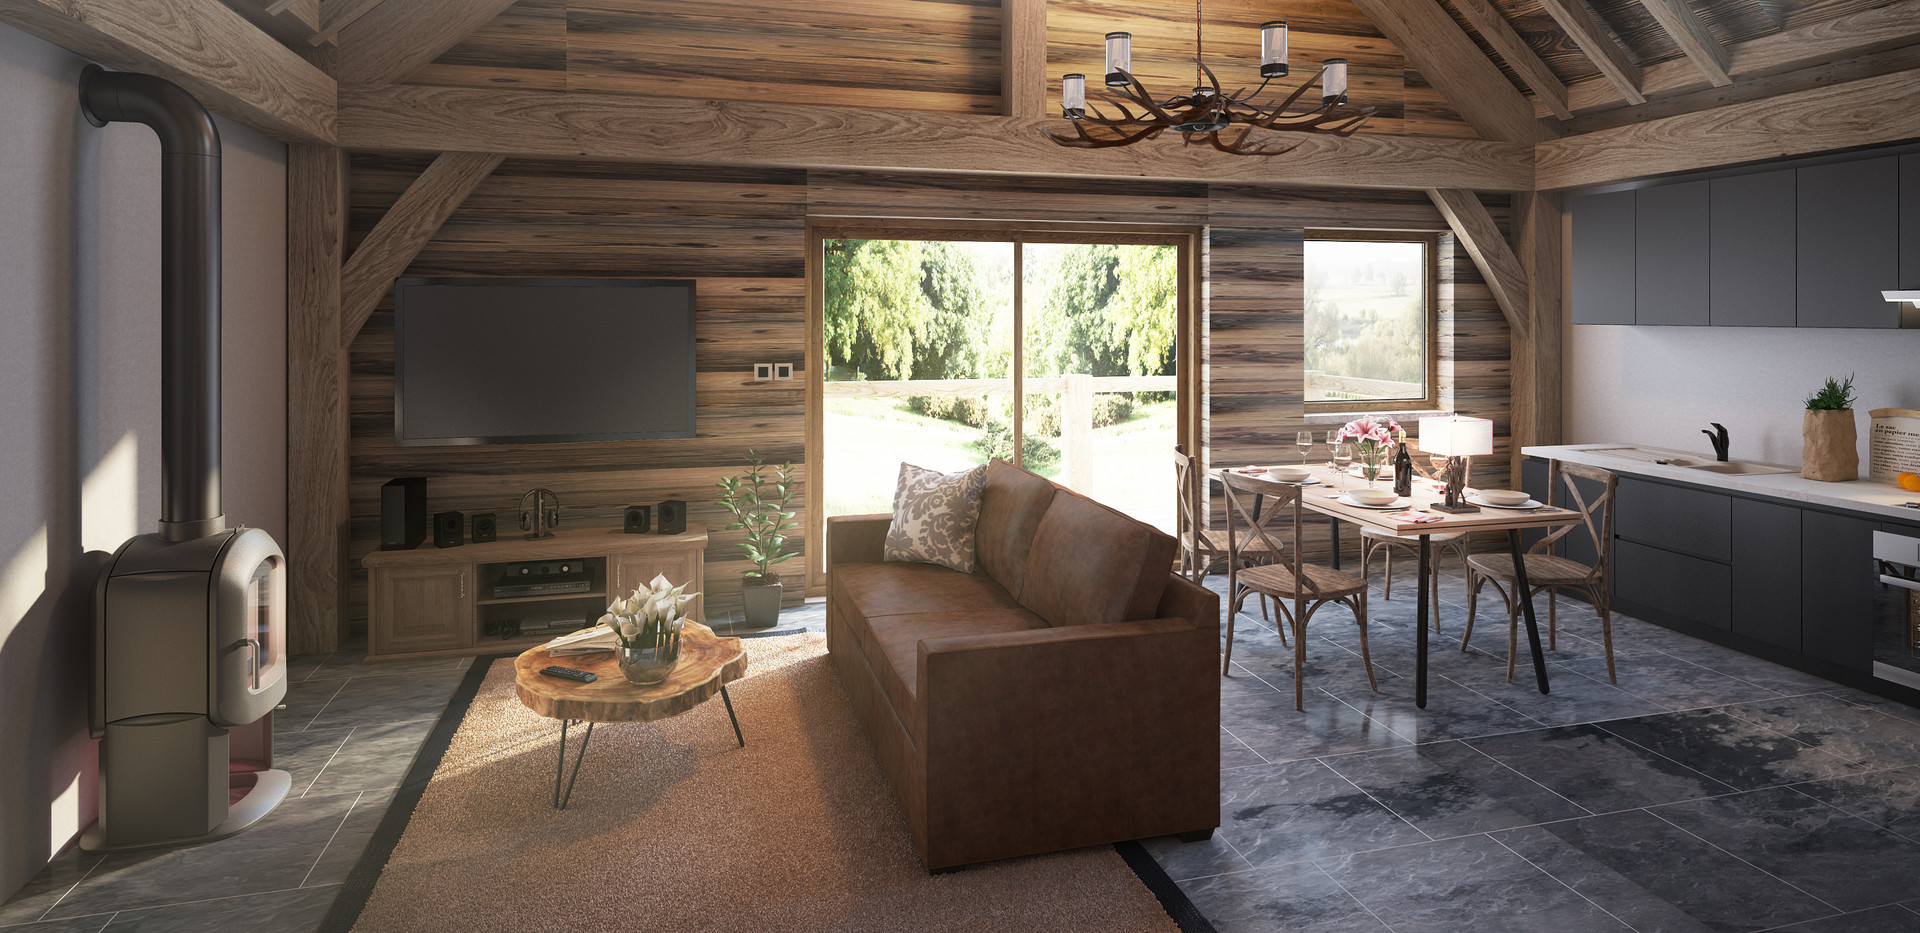 Wooden Cabinet 1 (2).jpg